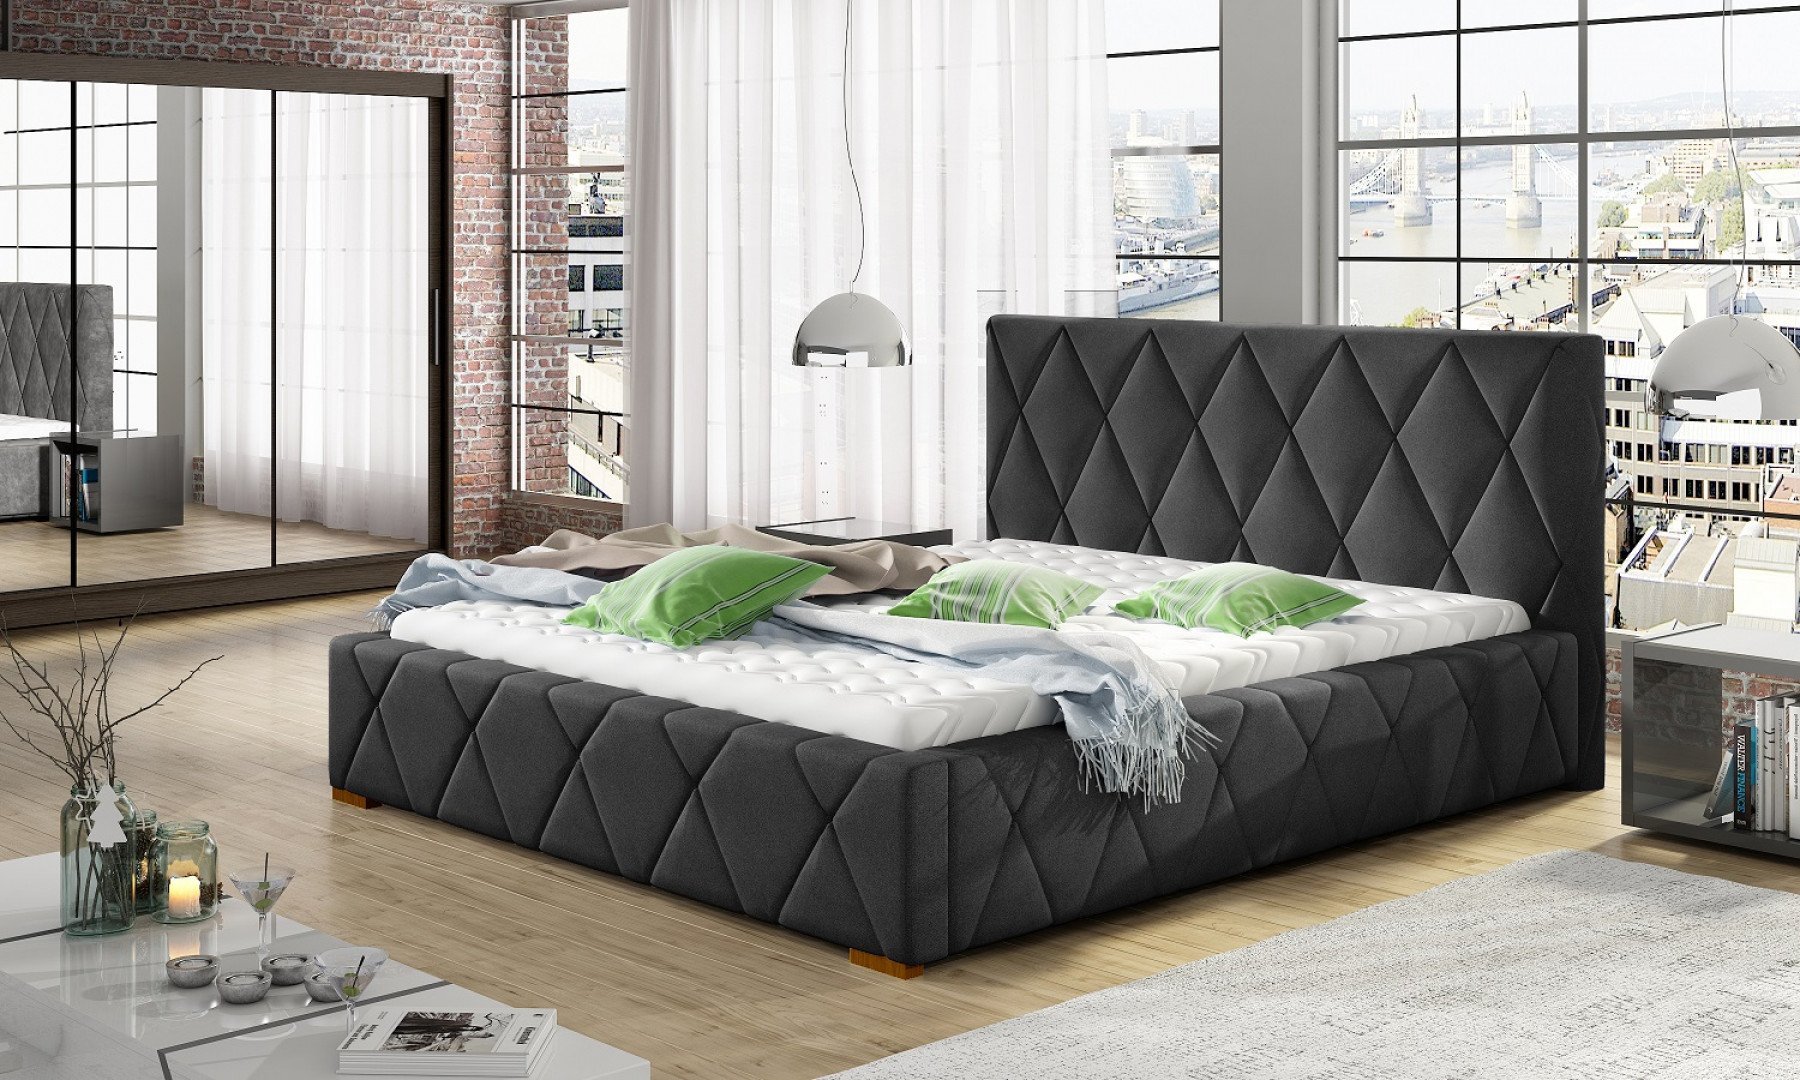 Łóżko tapicerowane Trivio marki Comforteo. Fot. Comforteo